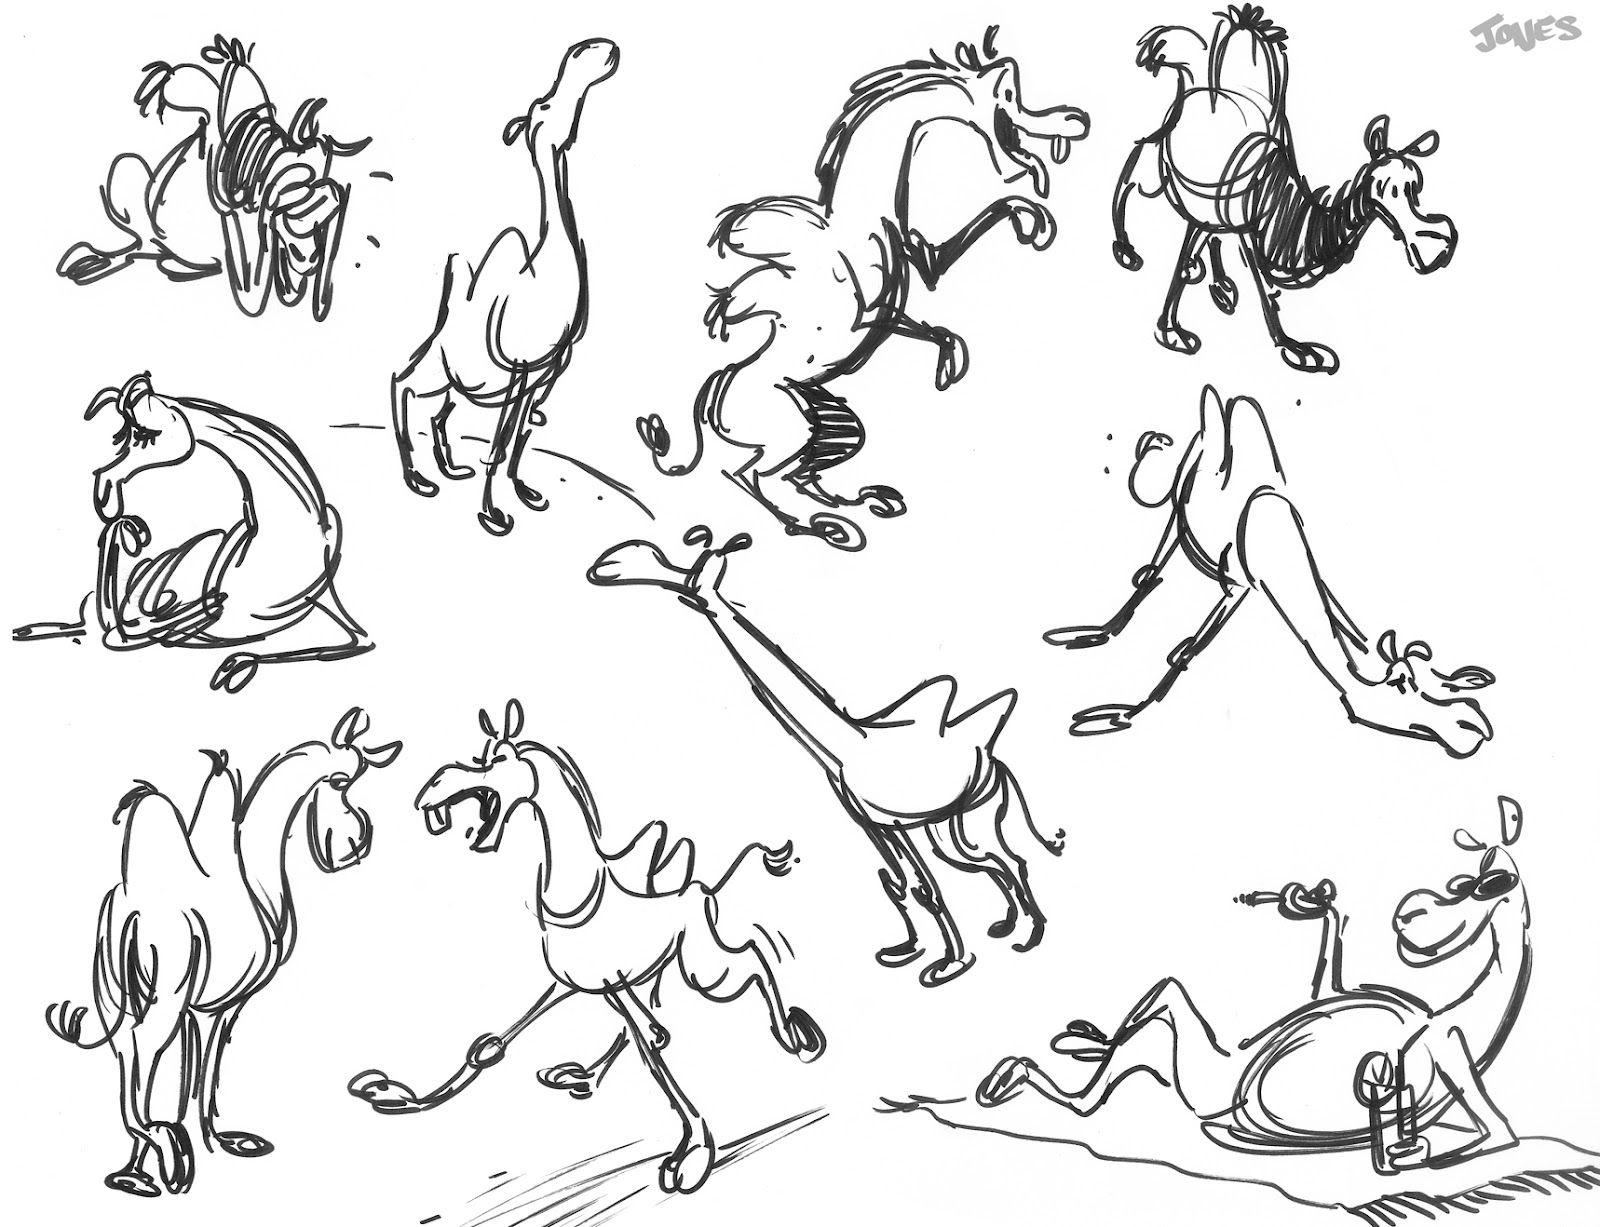 Matt Jones: Gesture Drawing | Matt Jones | Pinterest